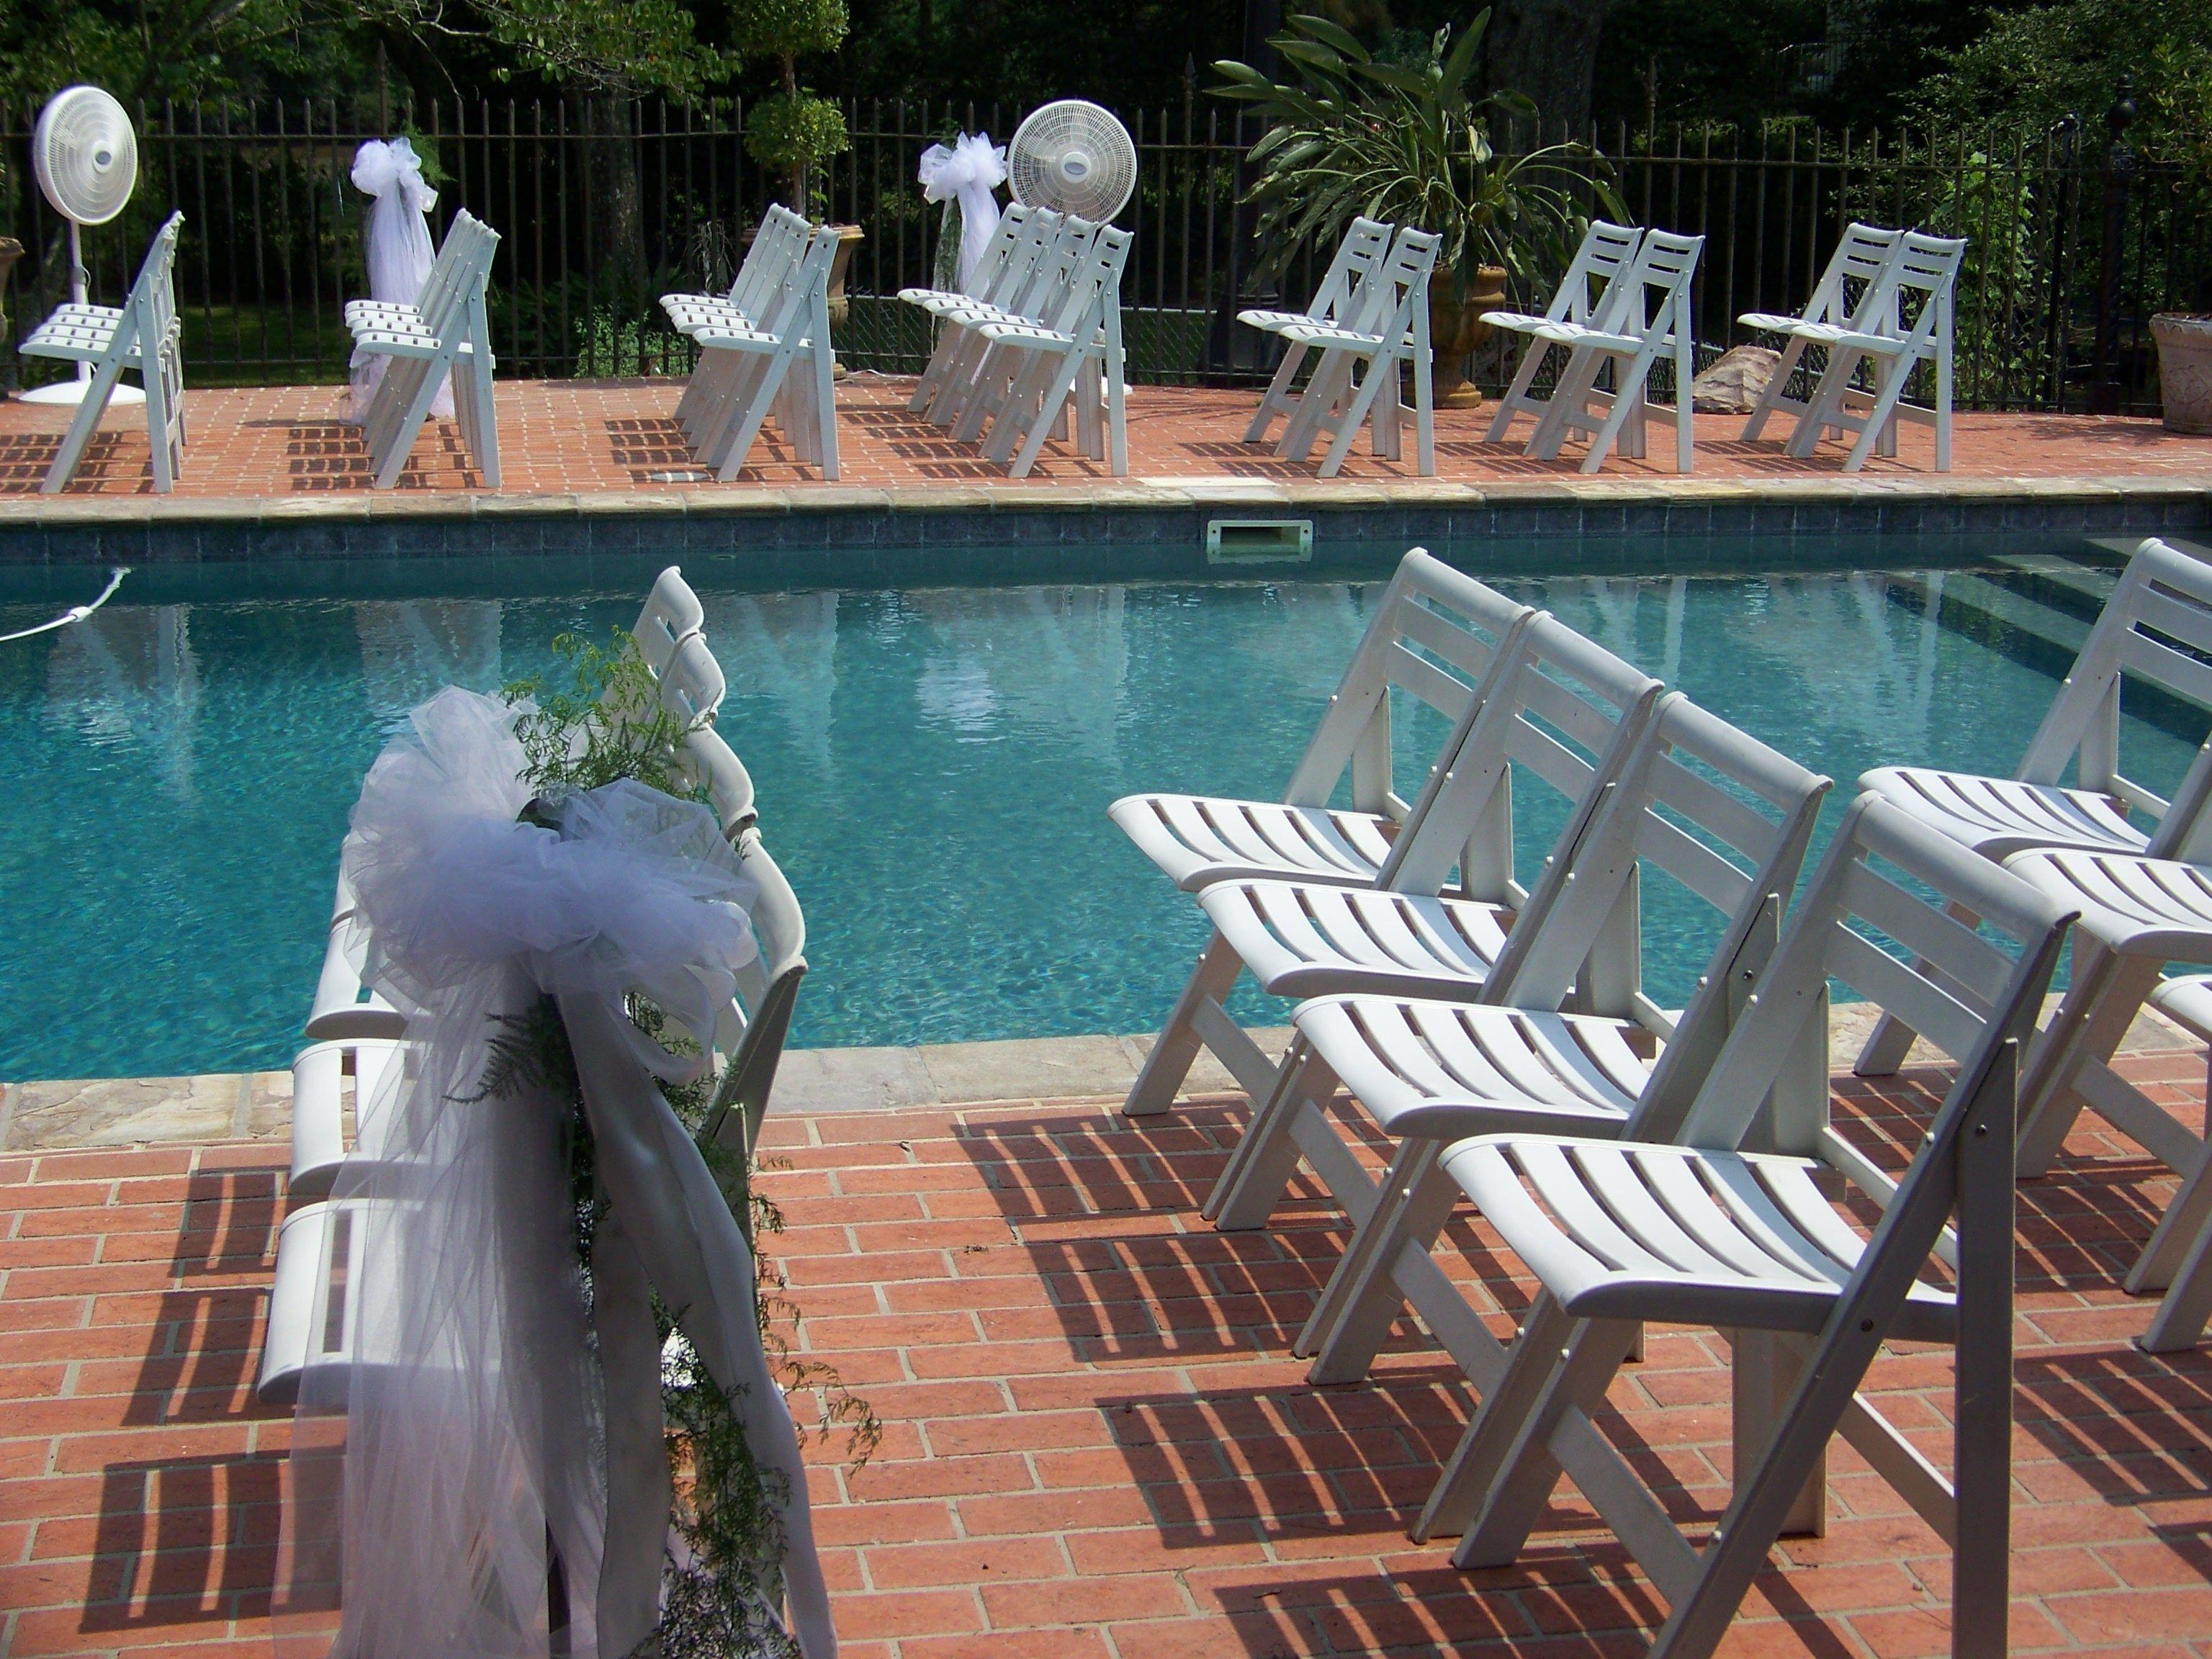 Poolside ceremony Pool wedding, Wedding package, Getting